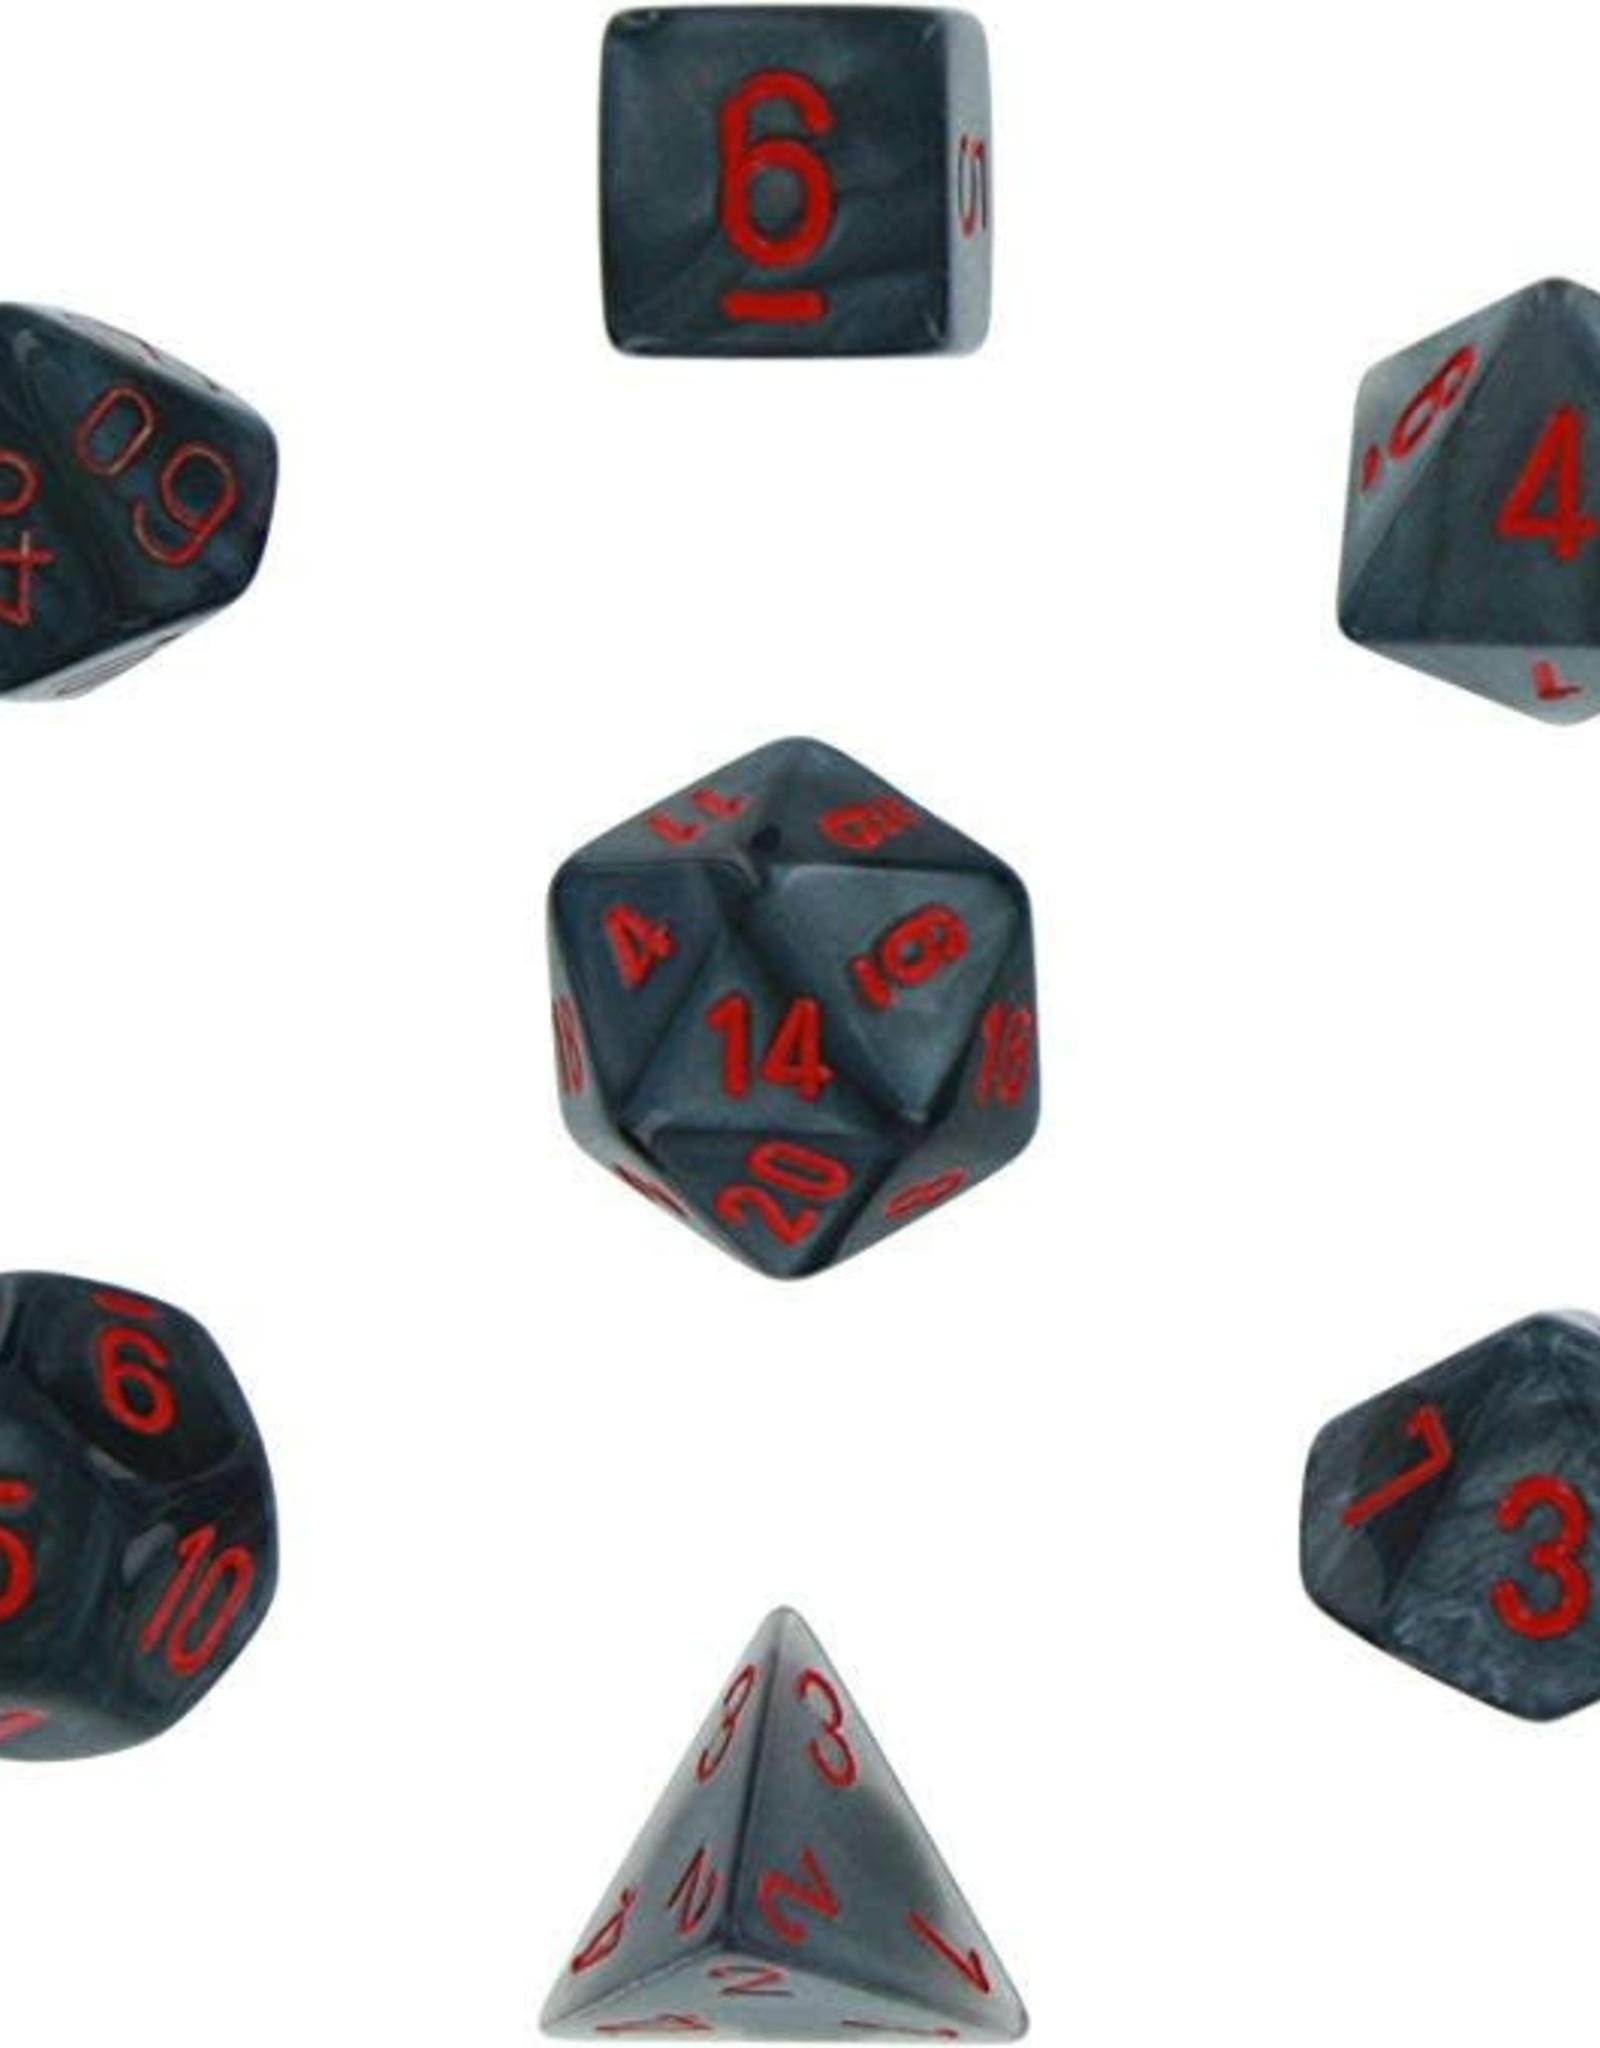 Chessex Dice Block 7ct. - Velvet Black/Red